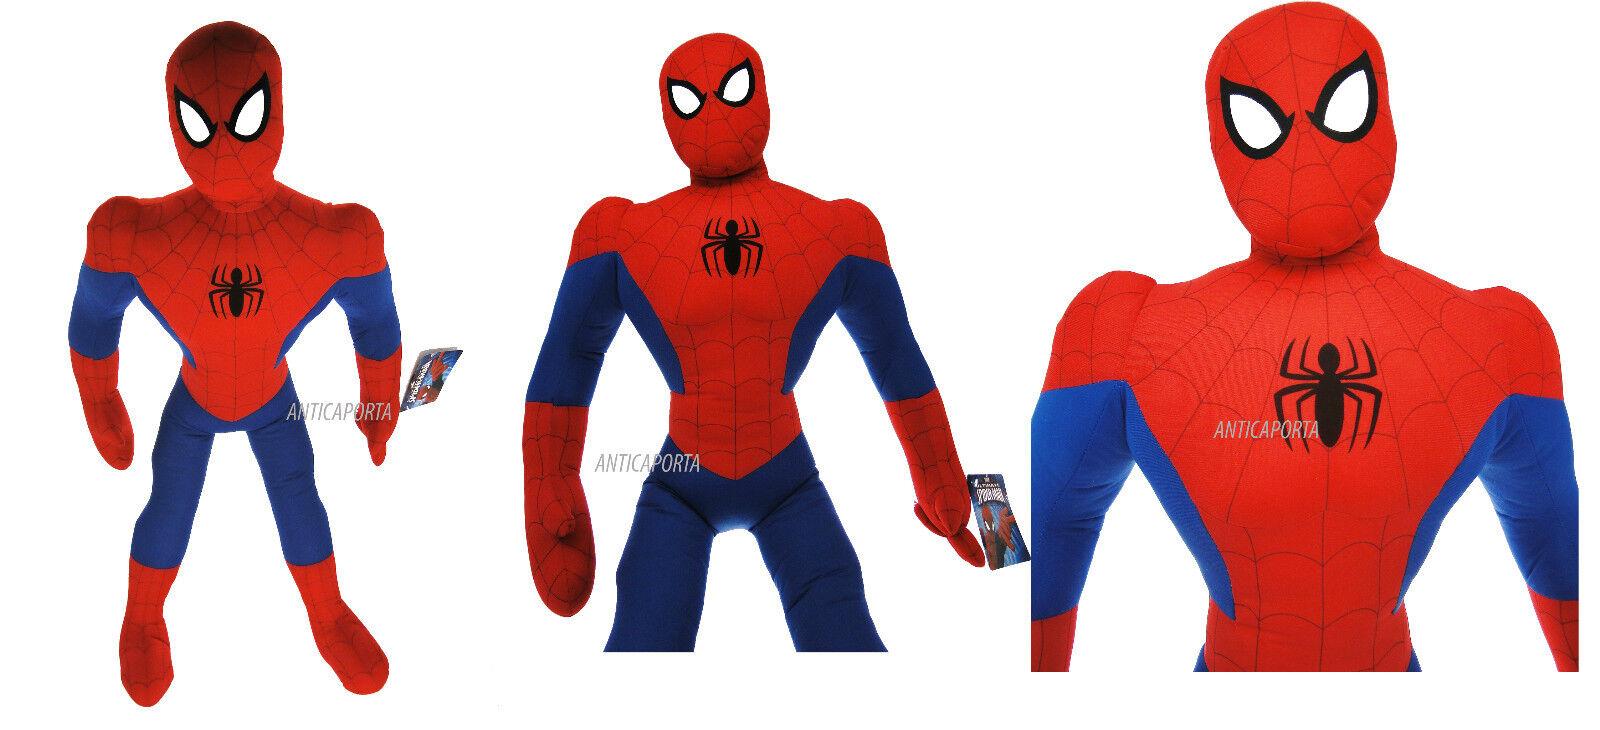 Peluche Original Spiderman Marvel 70 cm Spider-Man Énorme Géant Spider Man